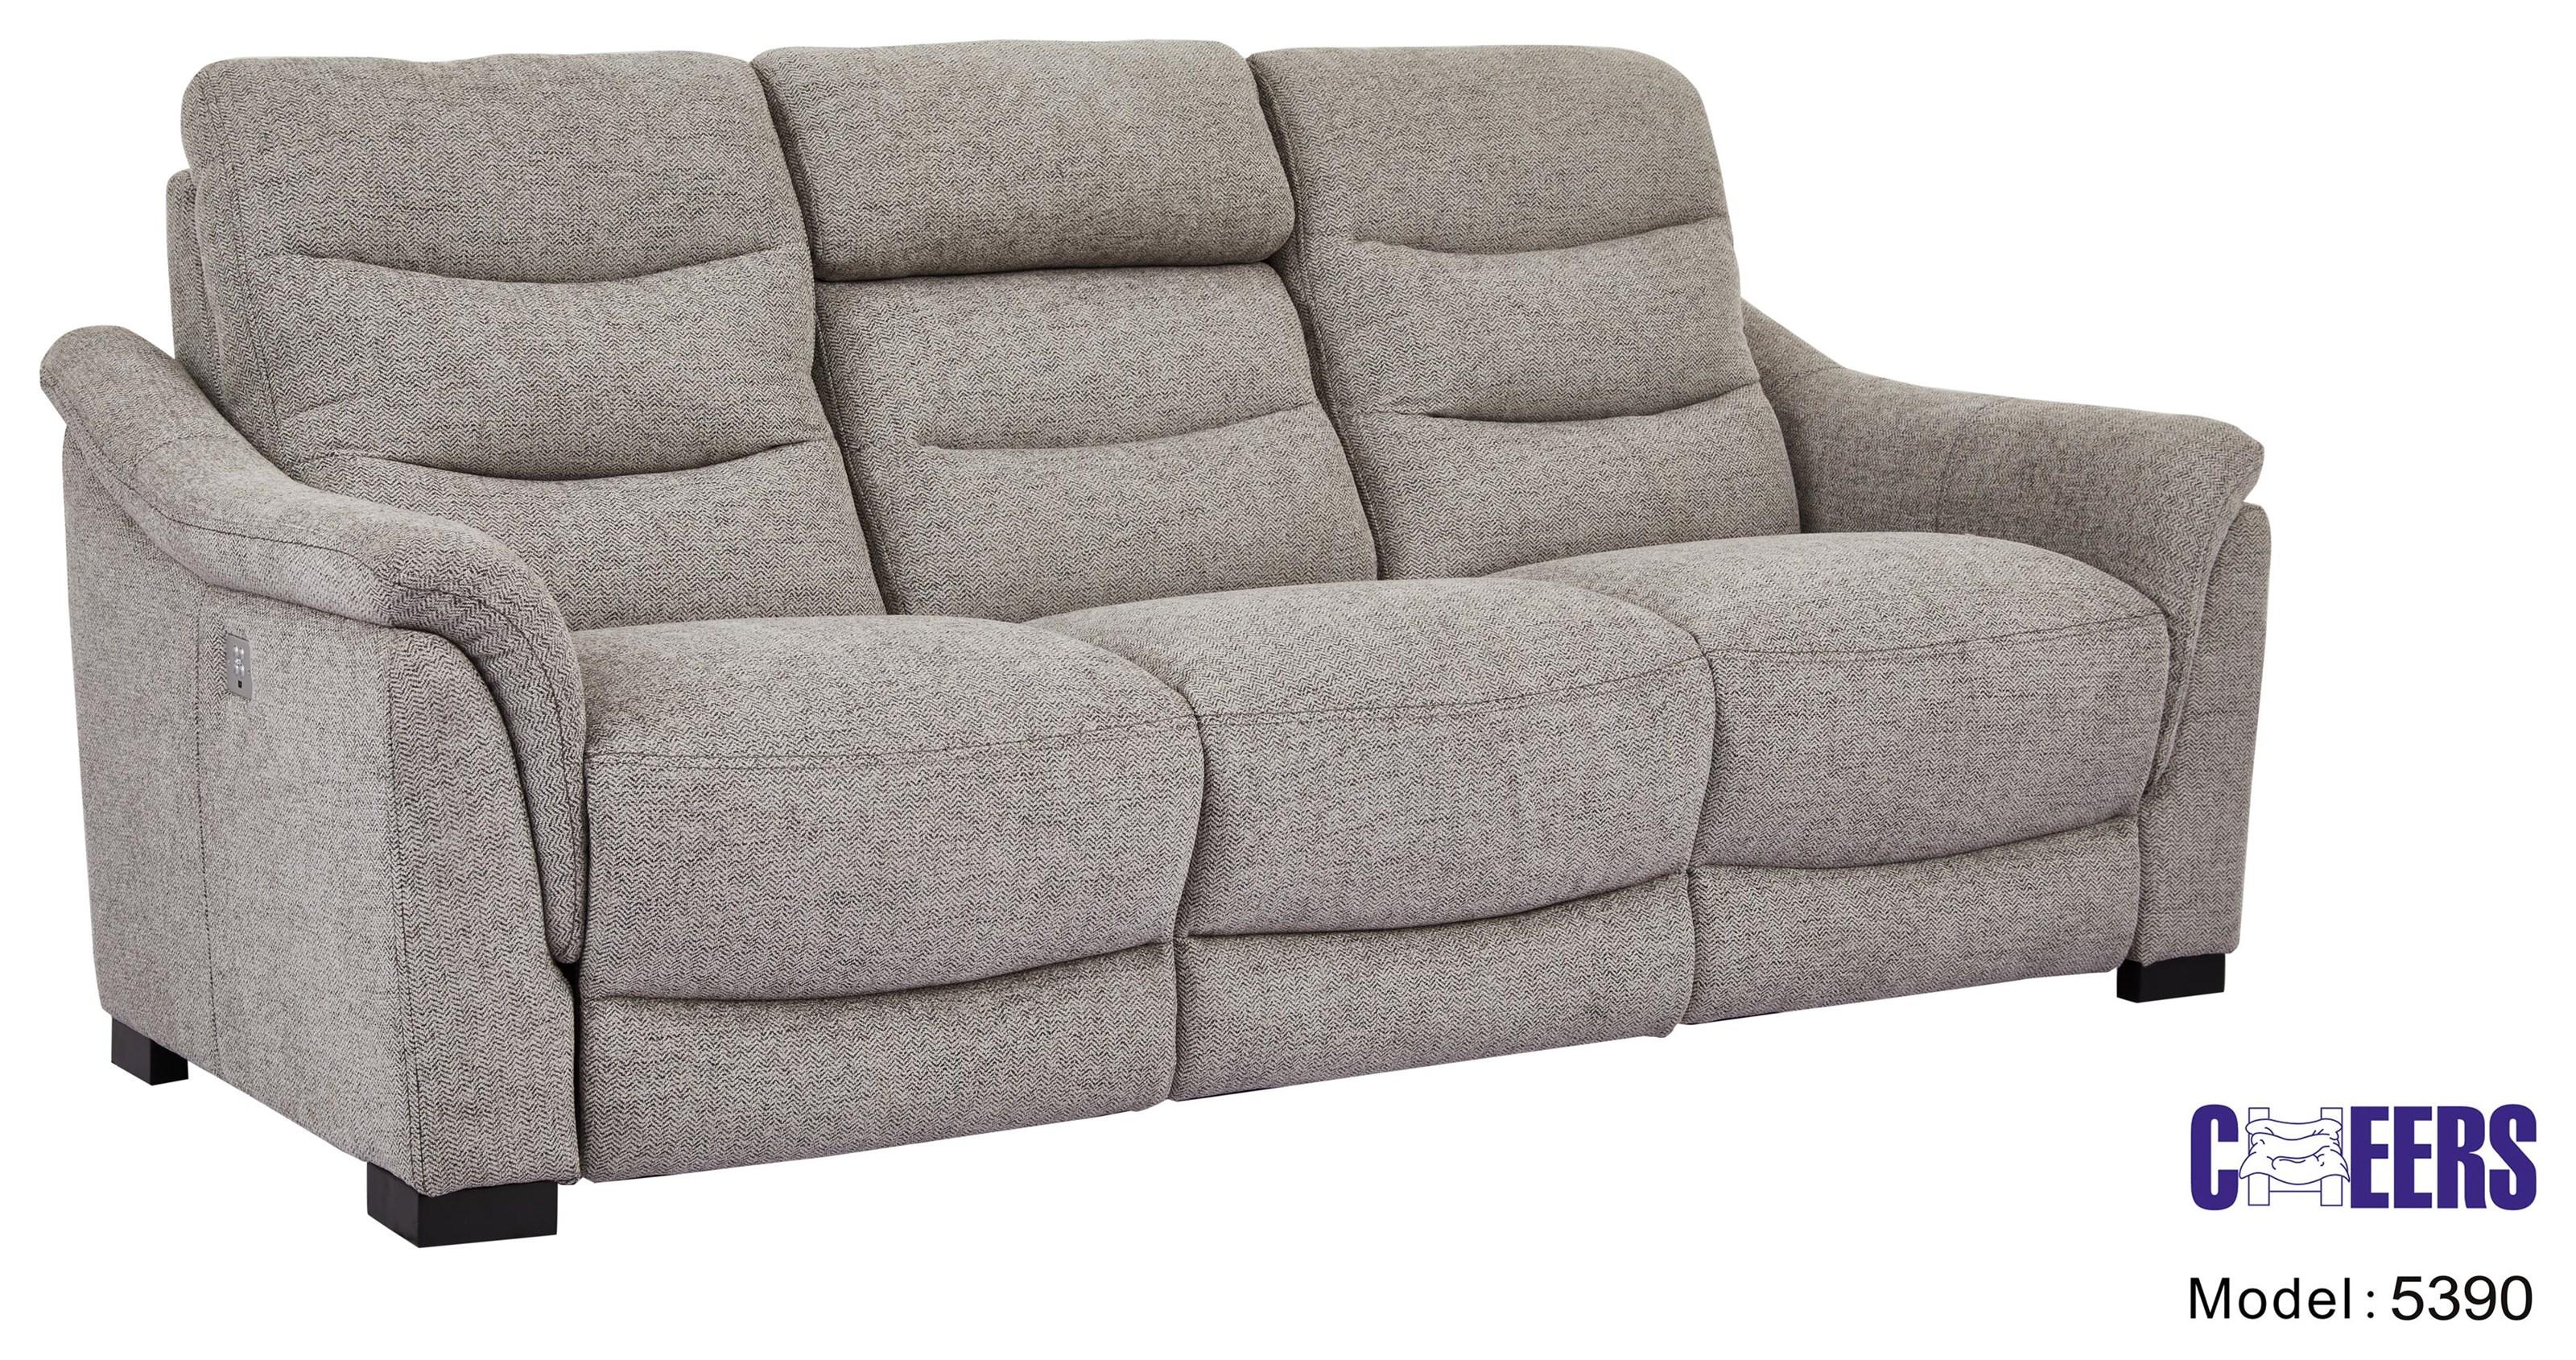 Power Head Sofa w/ Drop Table & Lights